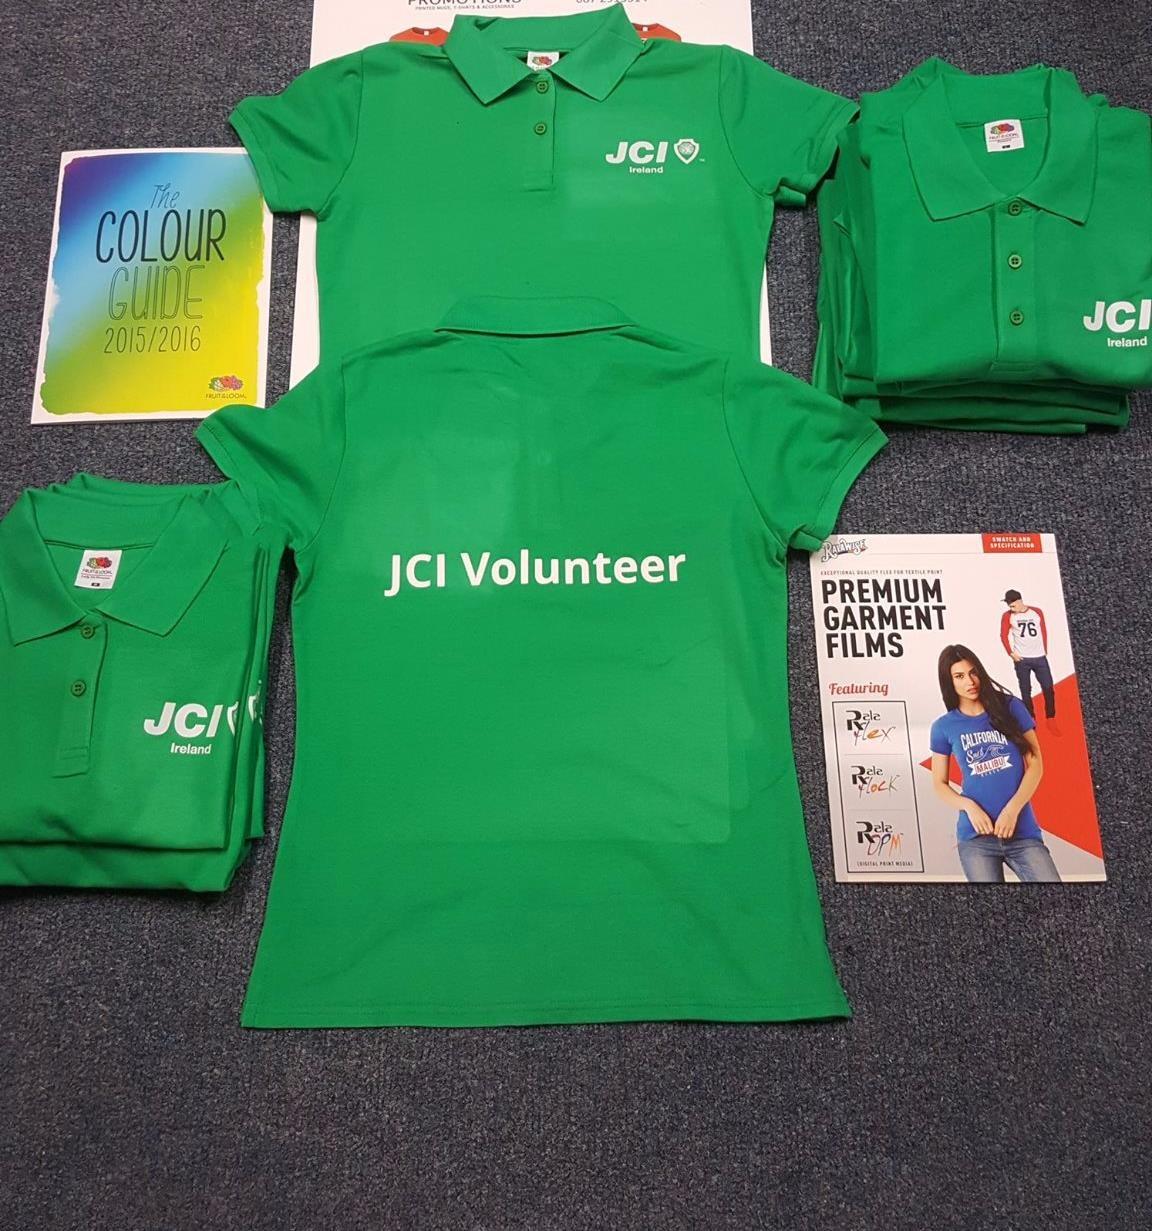 JCI Volunteer T-Shirts